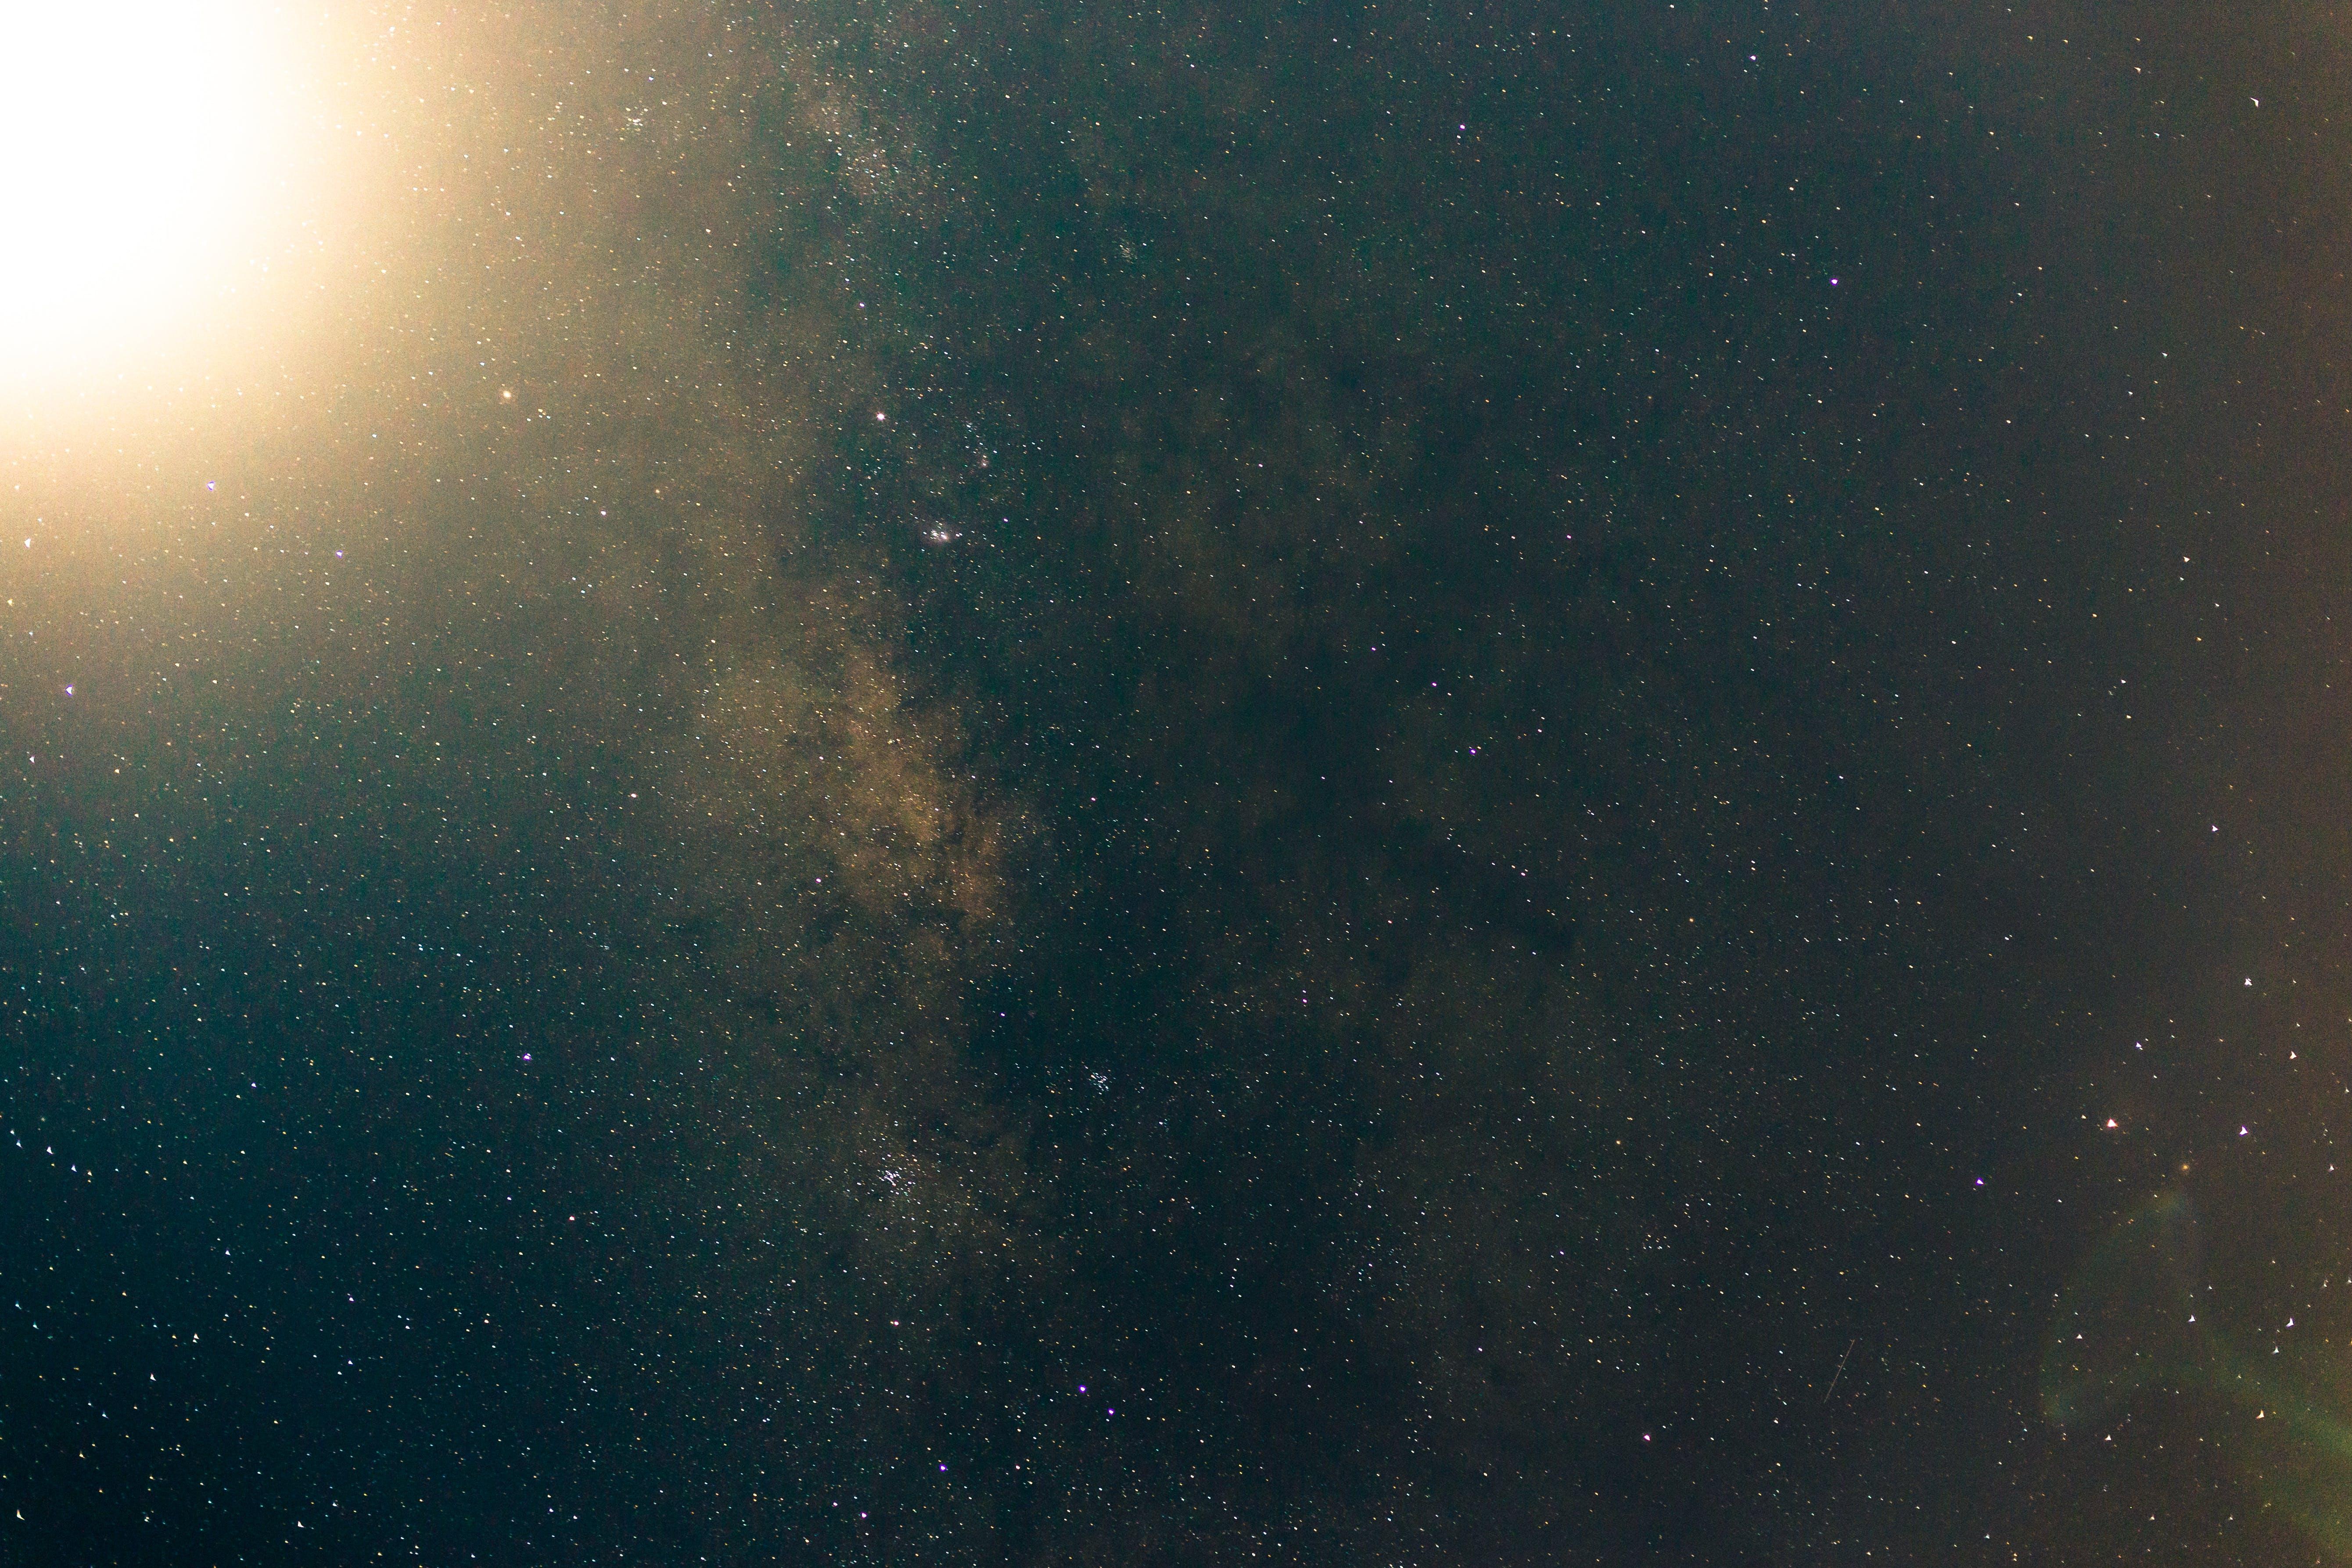 moom, 空間, 銀河, 長時間曝光 的 免費圖庫相片